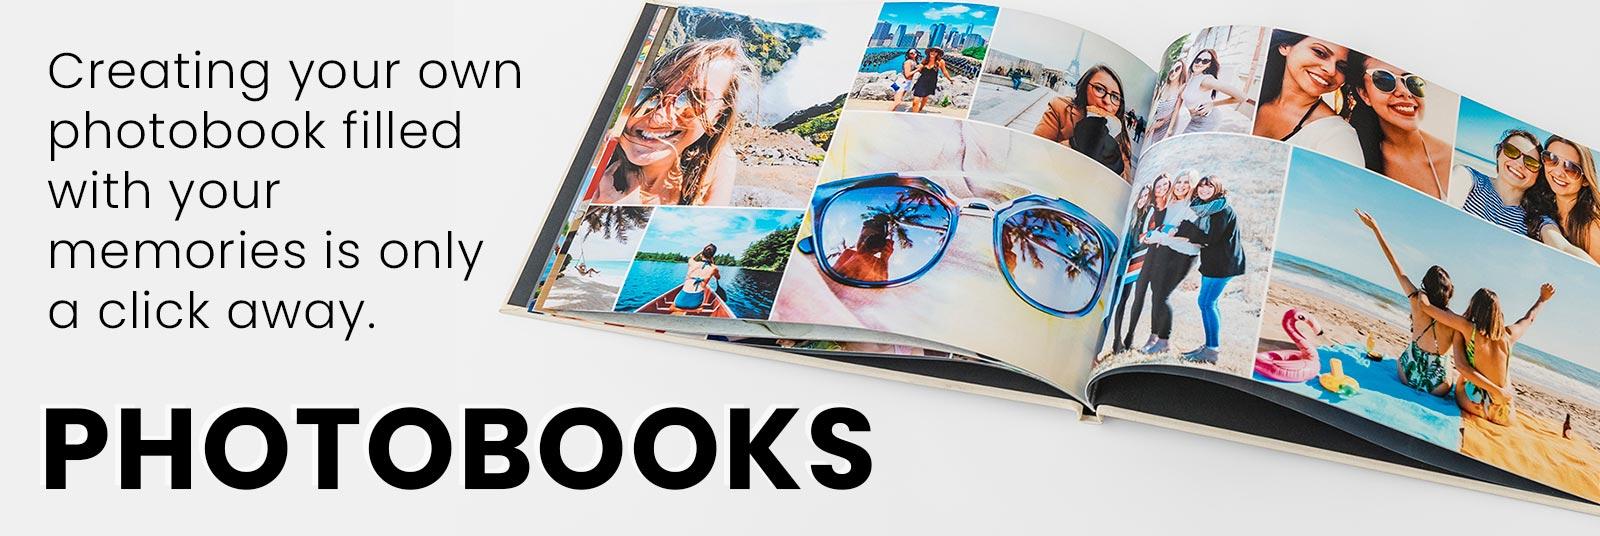 003 photobooks